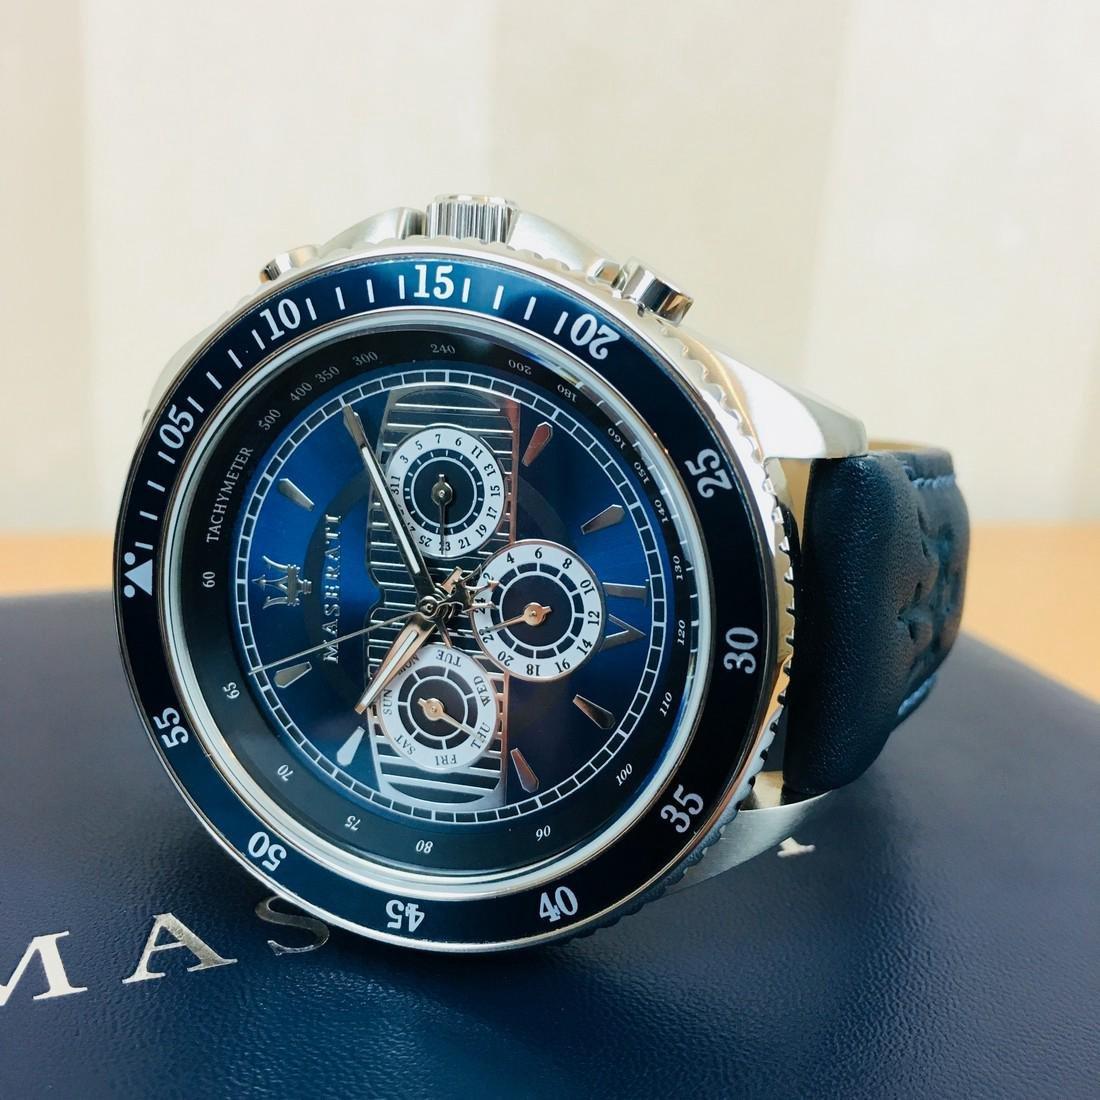 MASERATI – Men's Quartz Chronograph Watch - 10